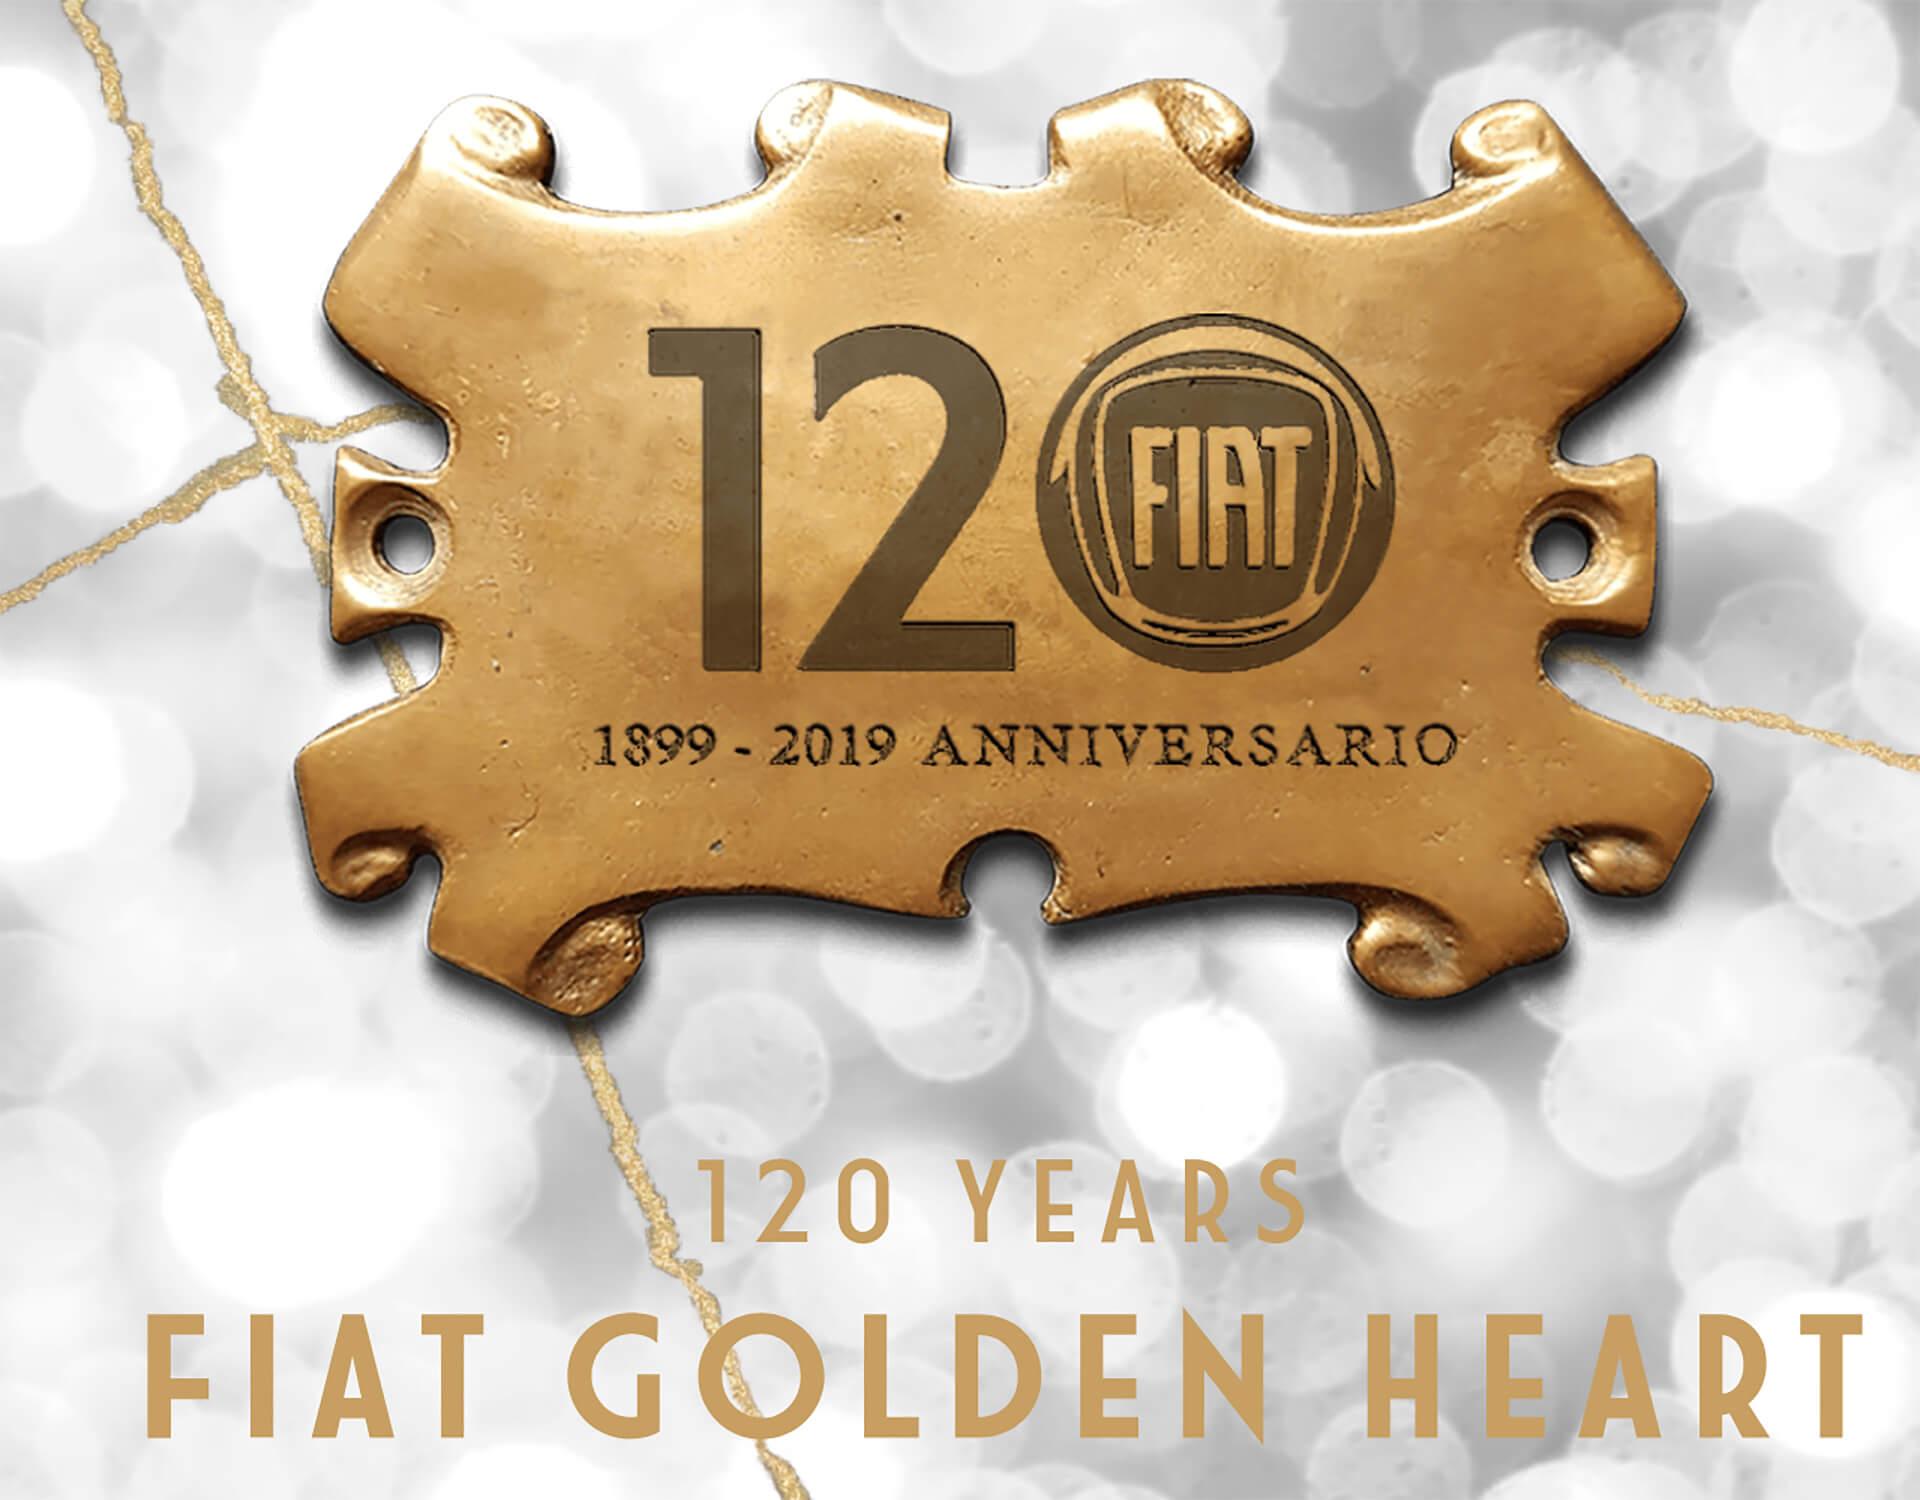 FIAT GOLDEN HEARTメインビジュアル